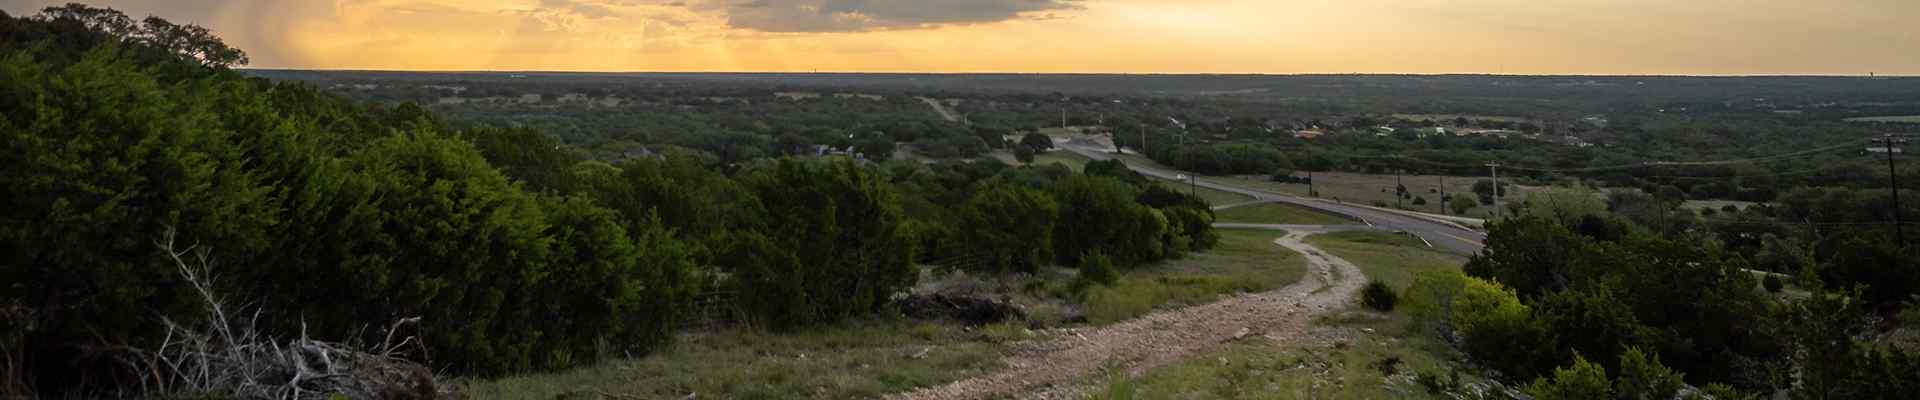 a road in little elm texas